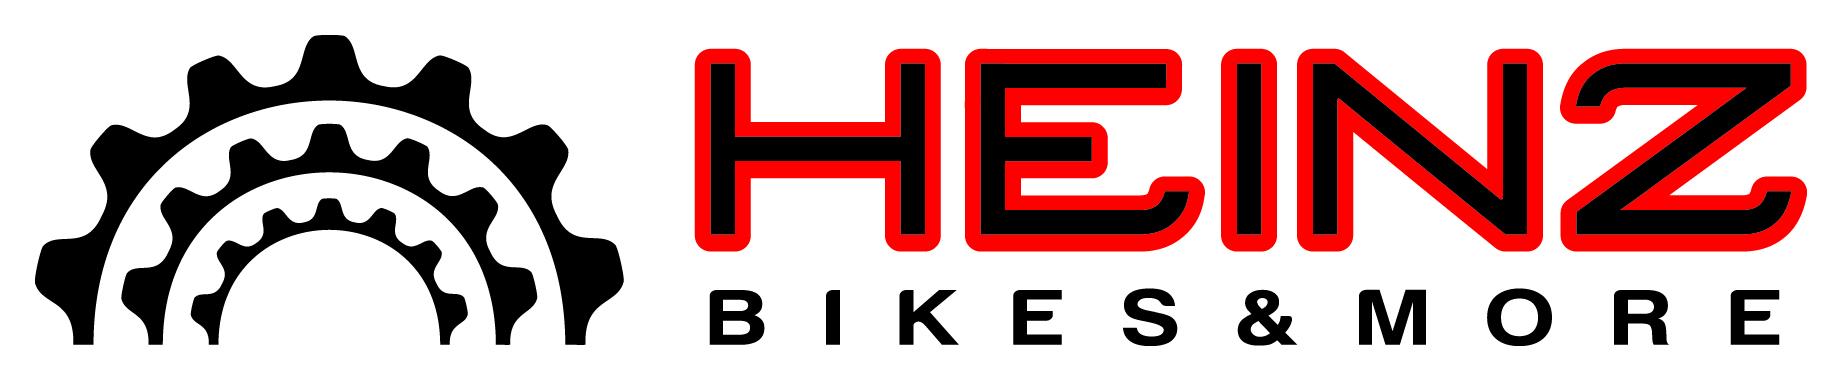 Getränke-Pate Heinz Bikes & more